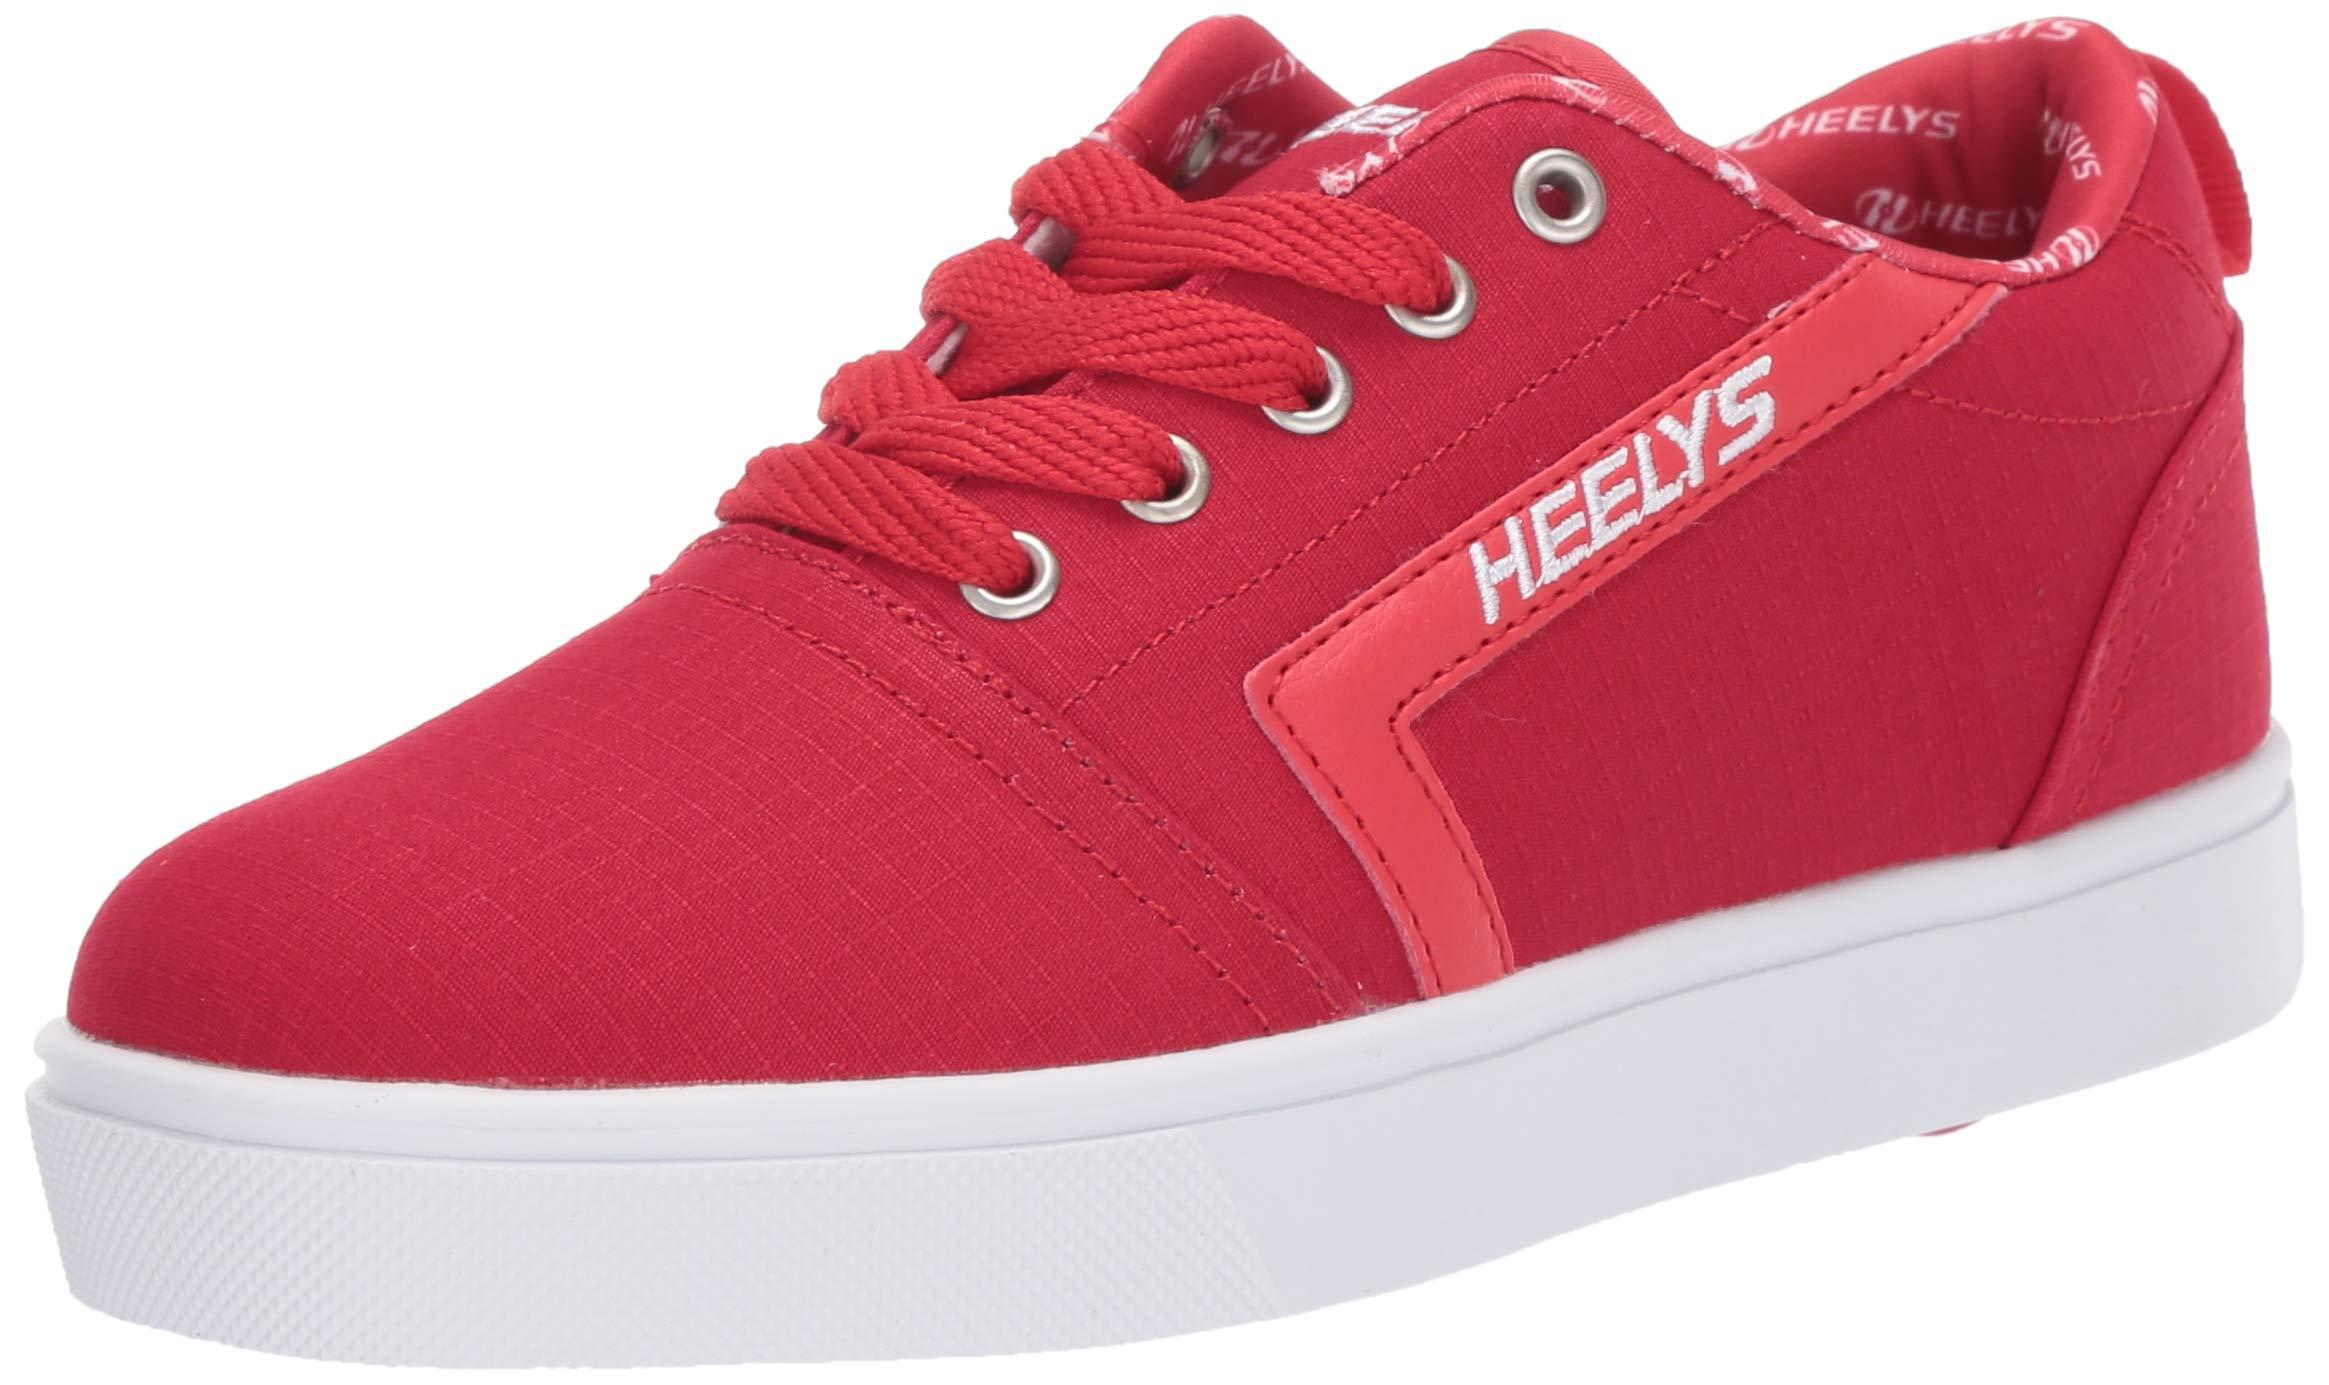 Heelys Boys' GR8 Pro Tennis Shoe RED/White/RIP Stop 1 M US Big Kid